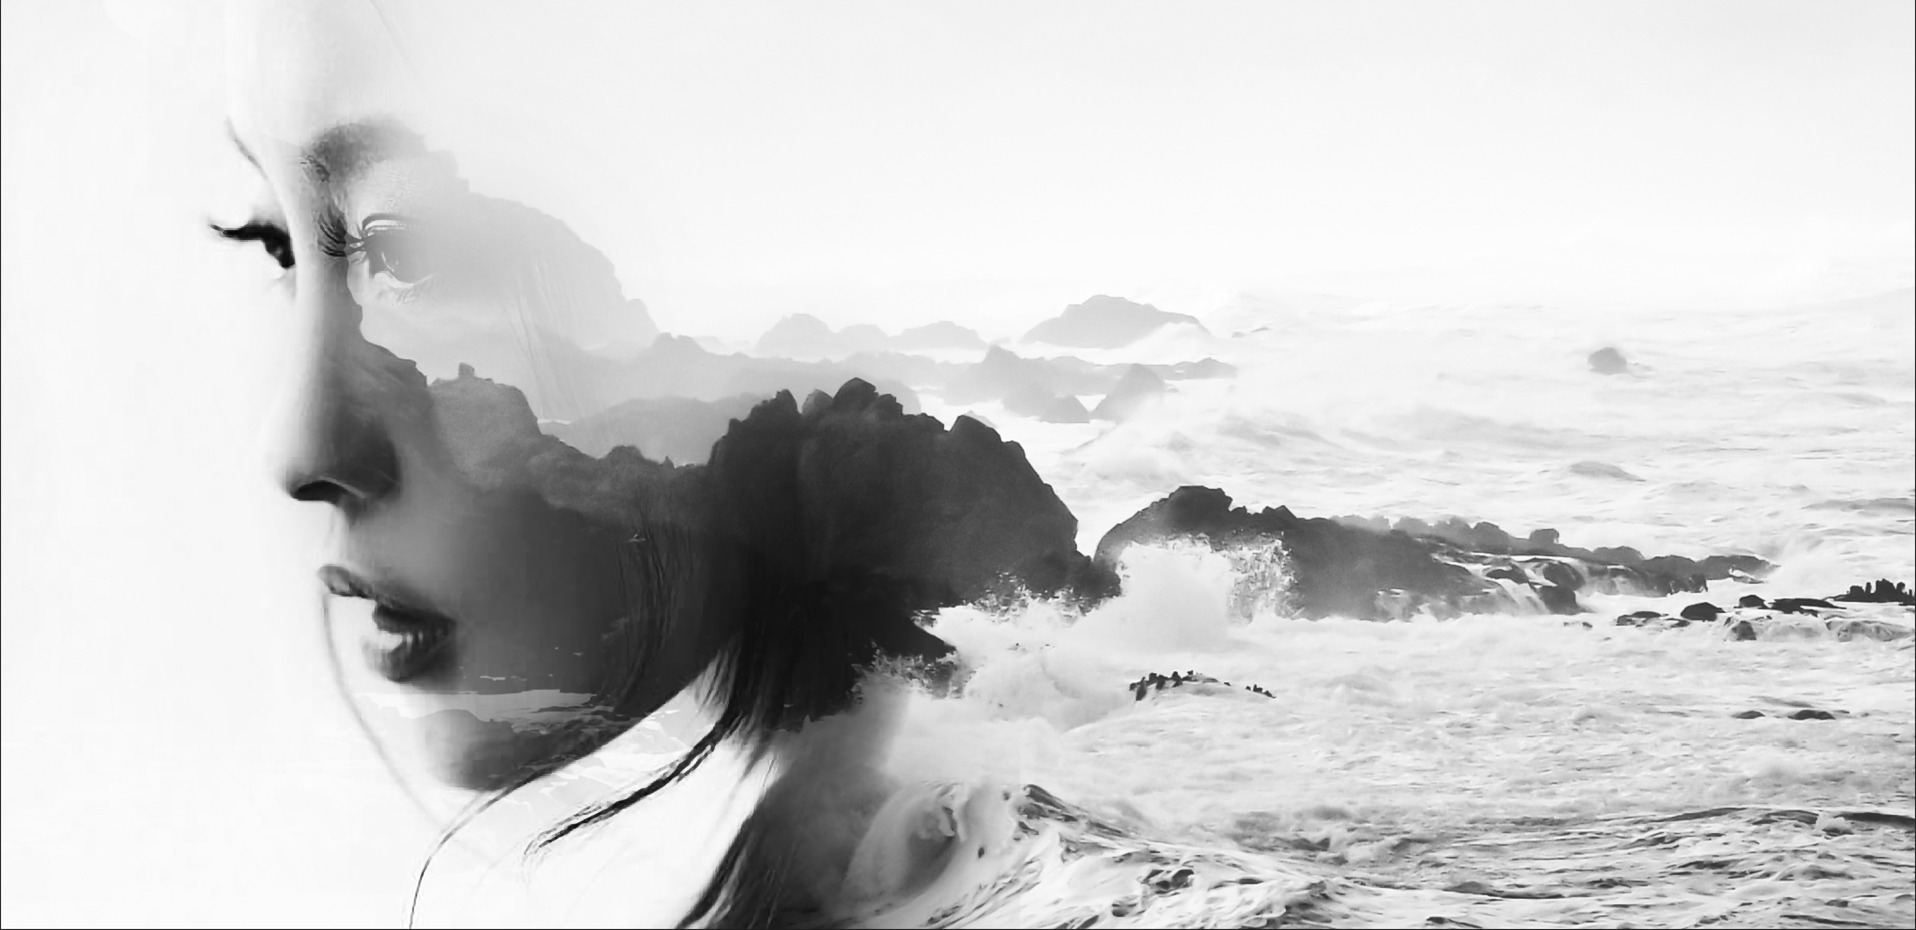 Longo Mare